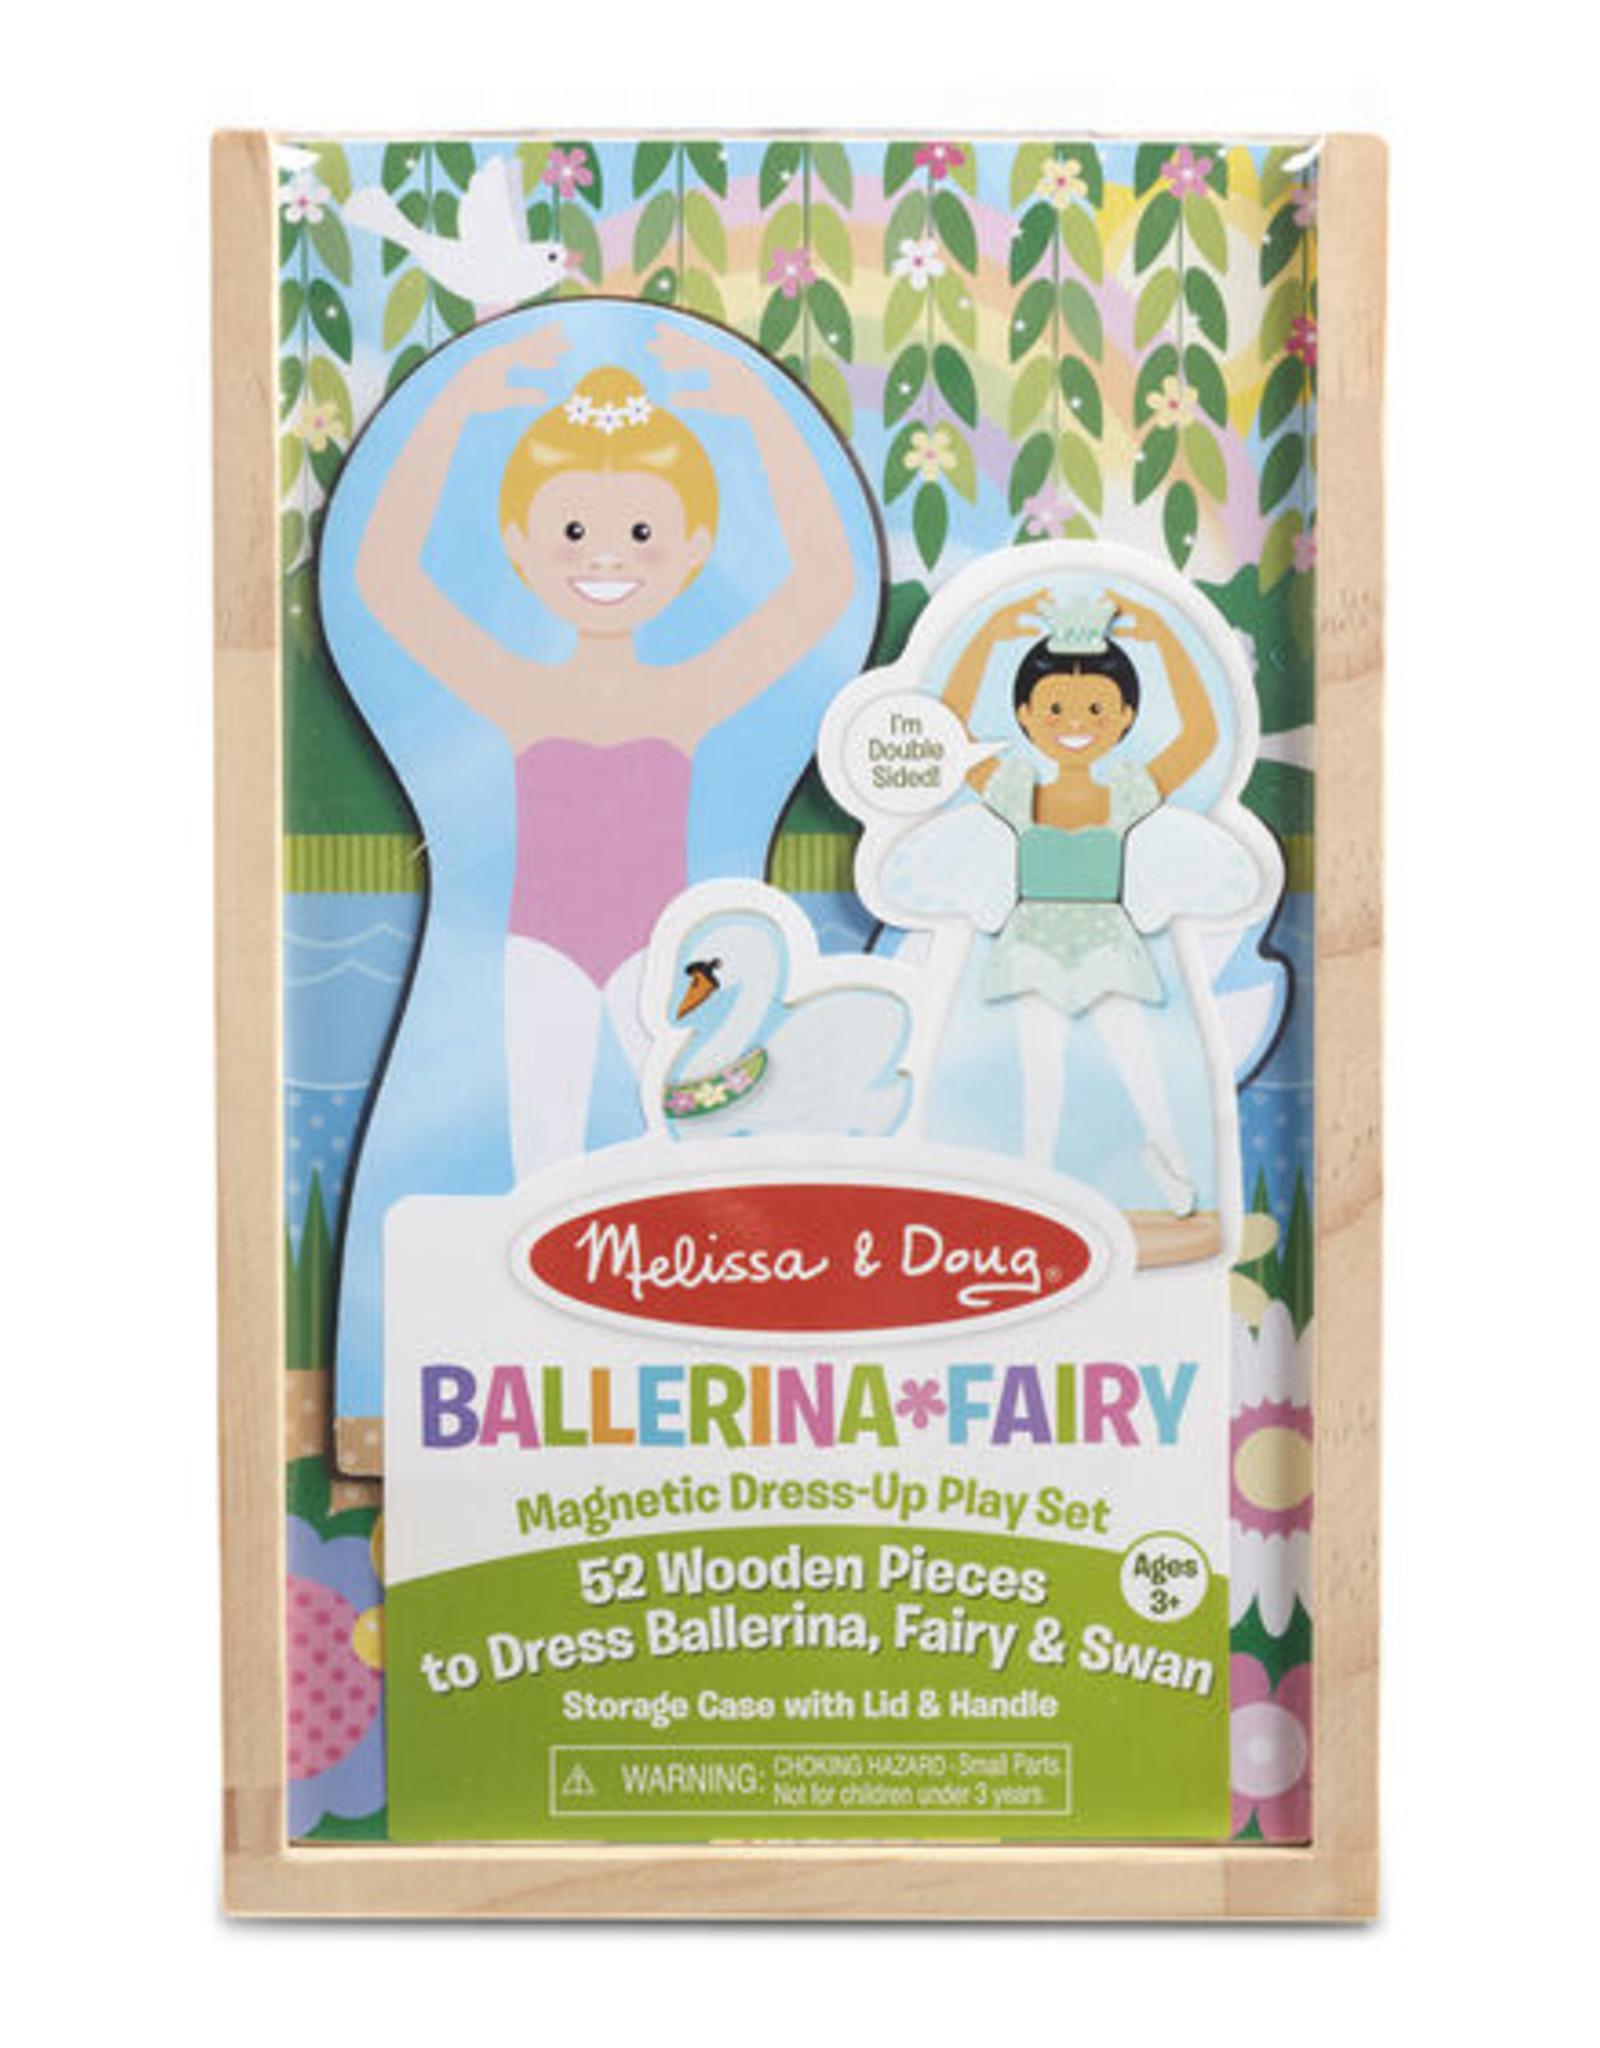 Melissa & Doug Magnetic Dress-Up Play Set- Ballerina/Fairy